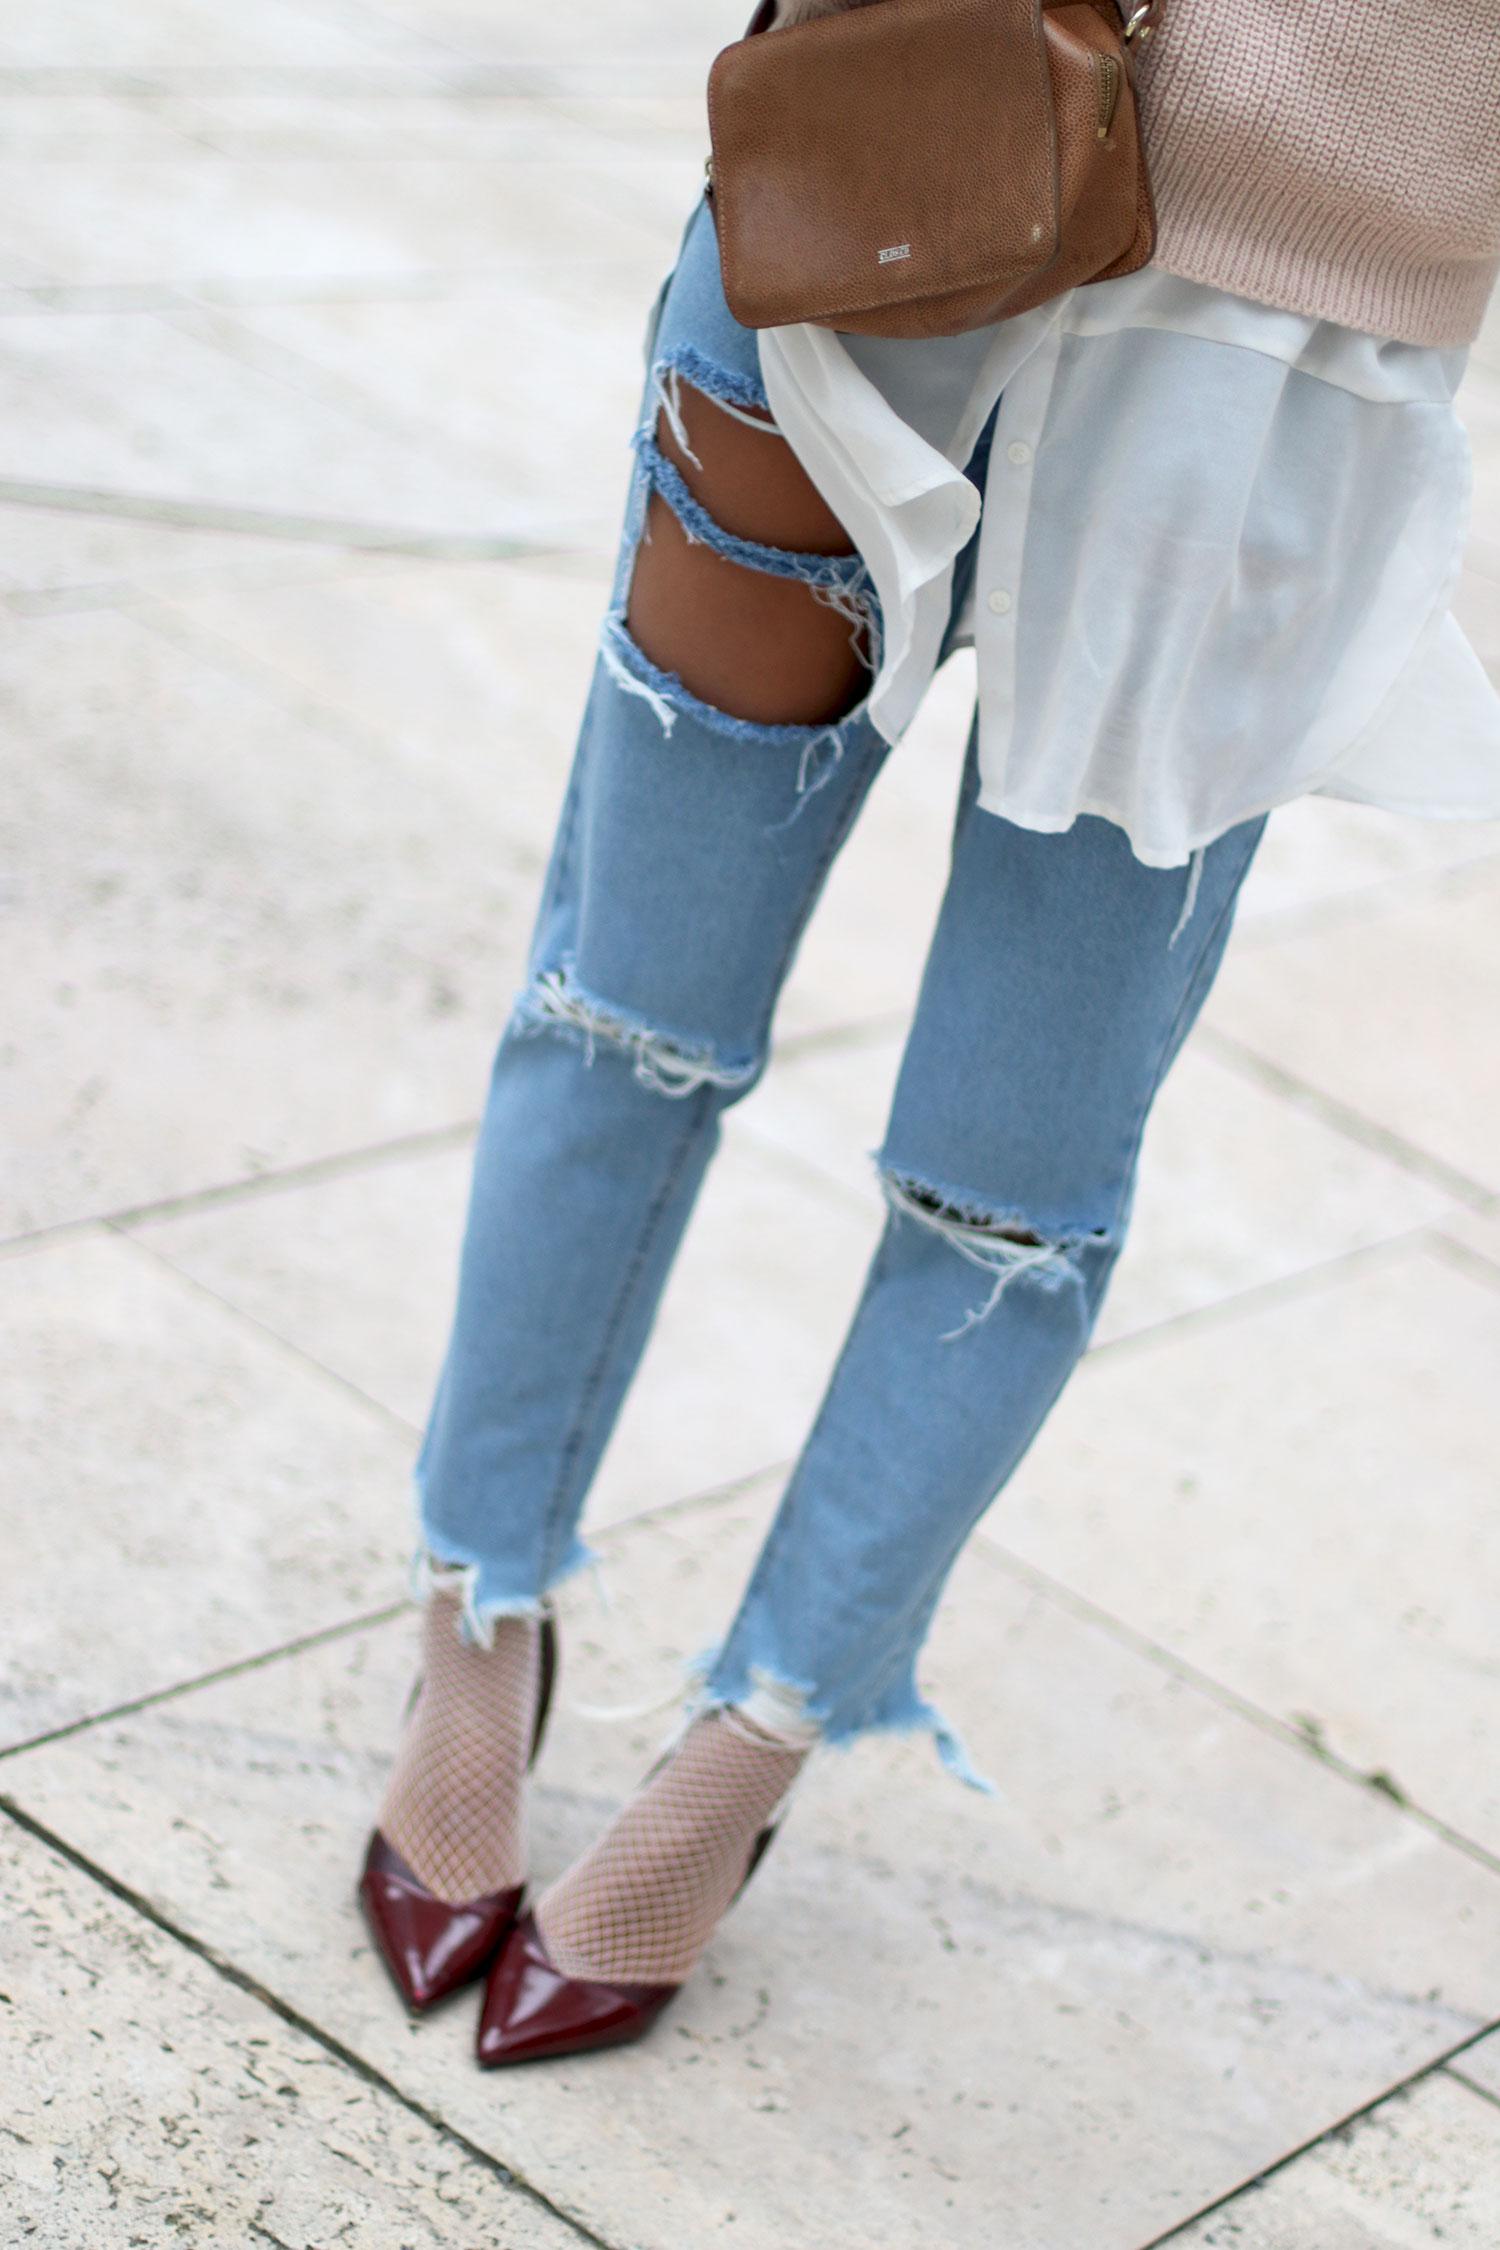 mesh-socks-and-heels